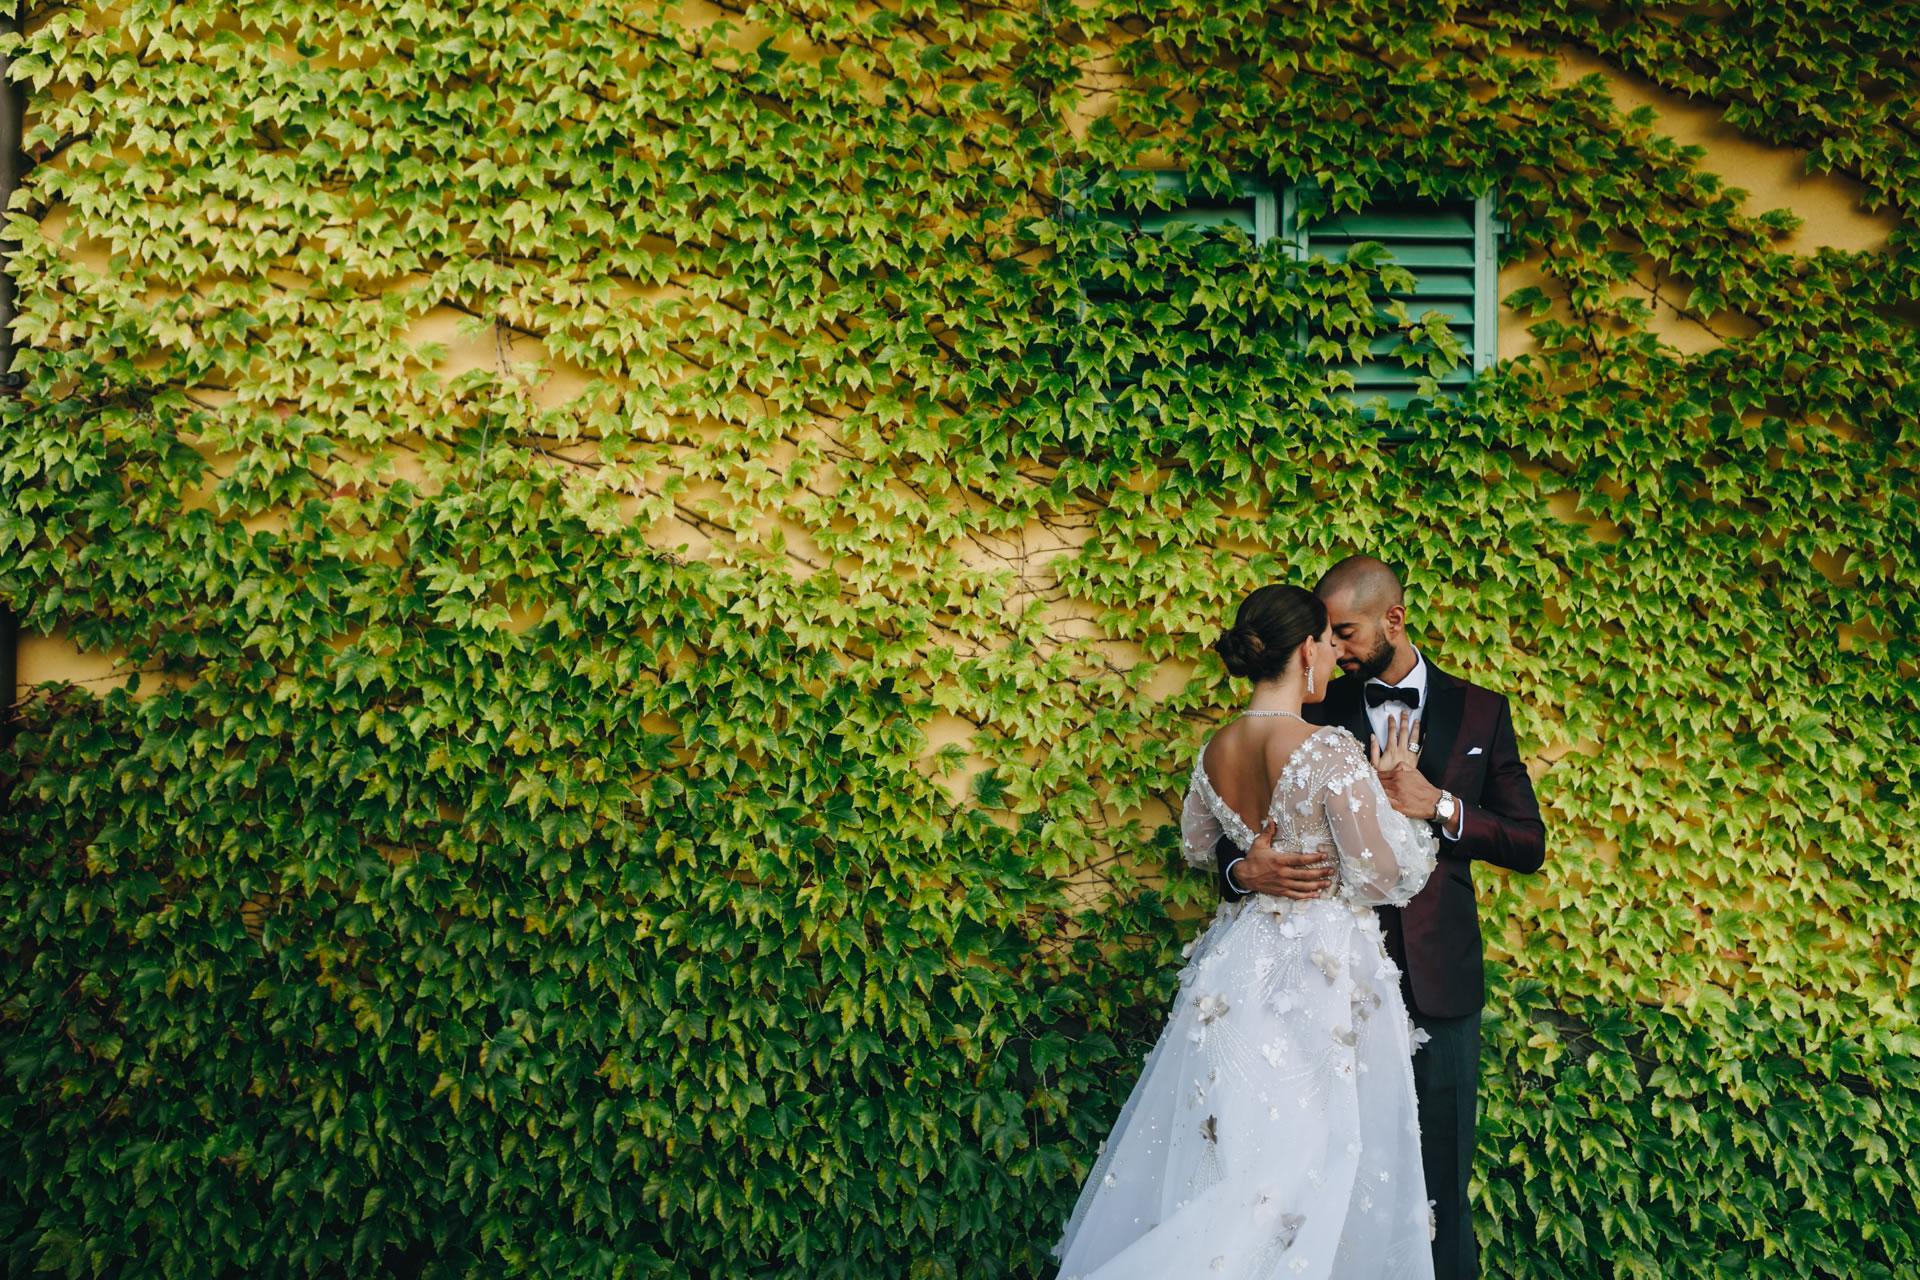 Green Ivy - 28 :: Luxury wedding at Il Borro :: Luxury wedding photography - 27 :: Green Ivy - 28